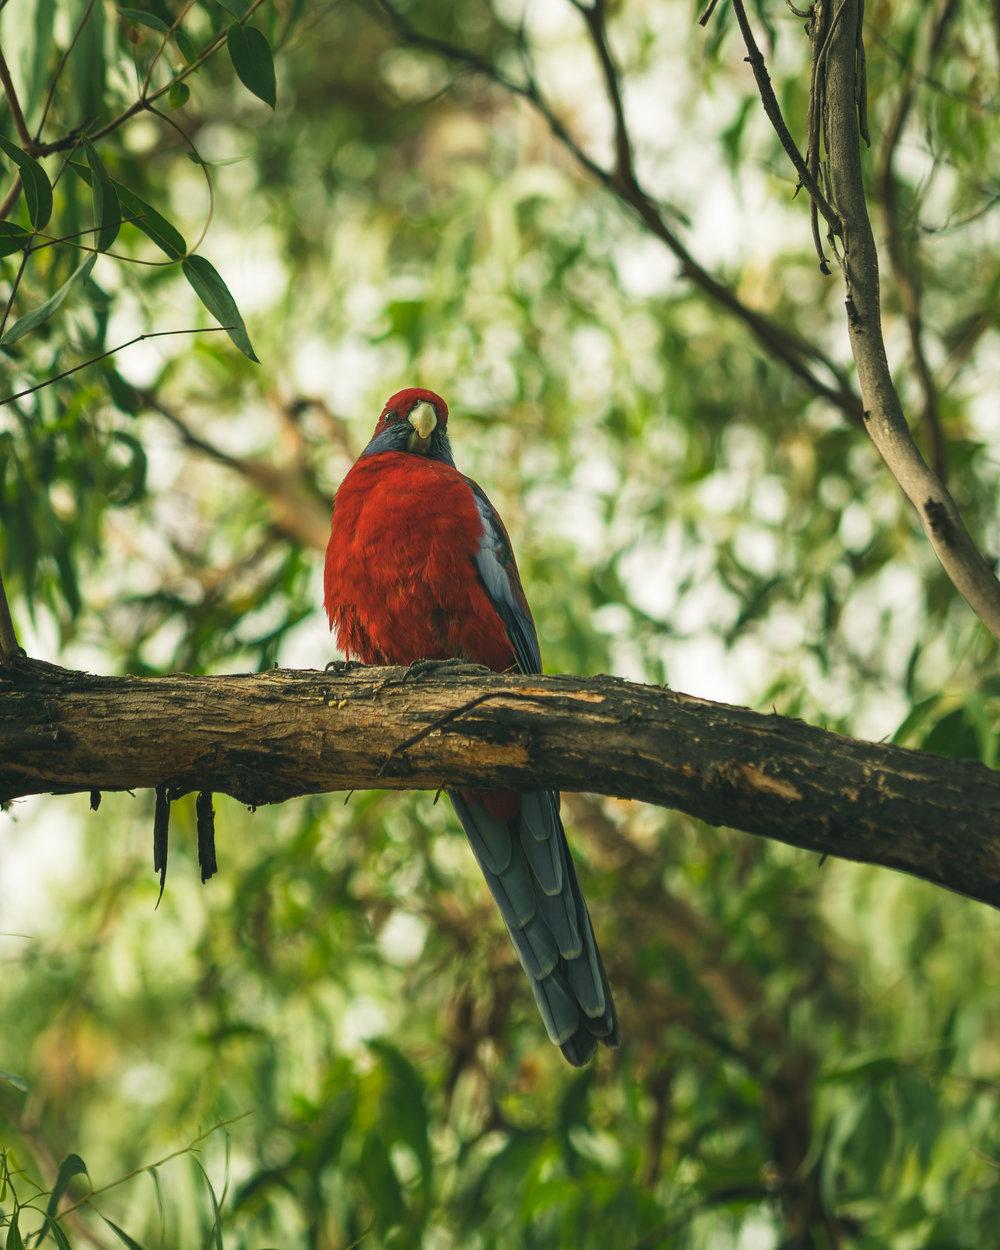 Raymond Island has pretty birds, too!